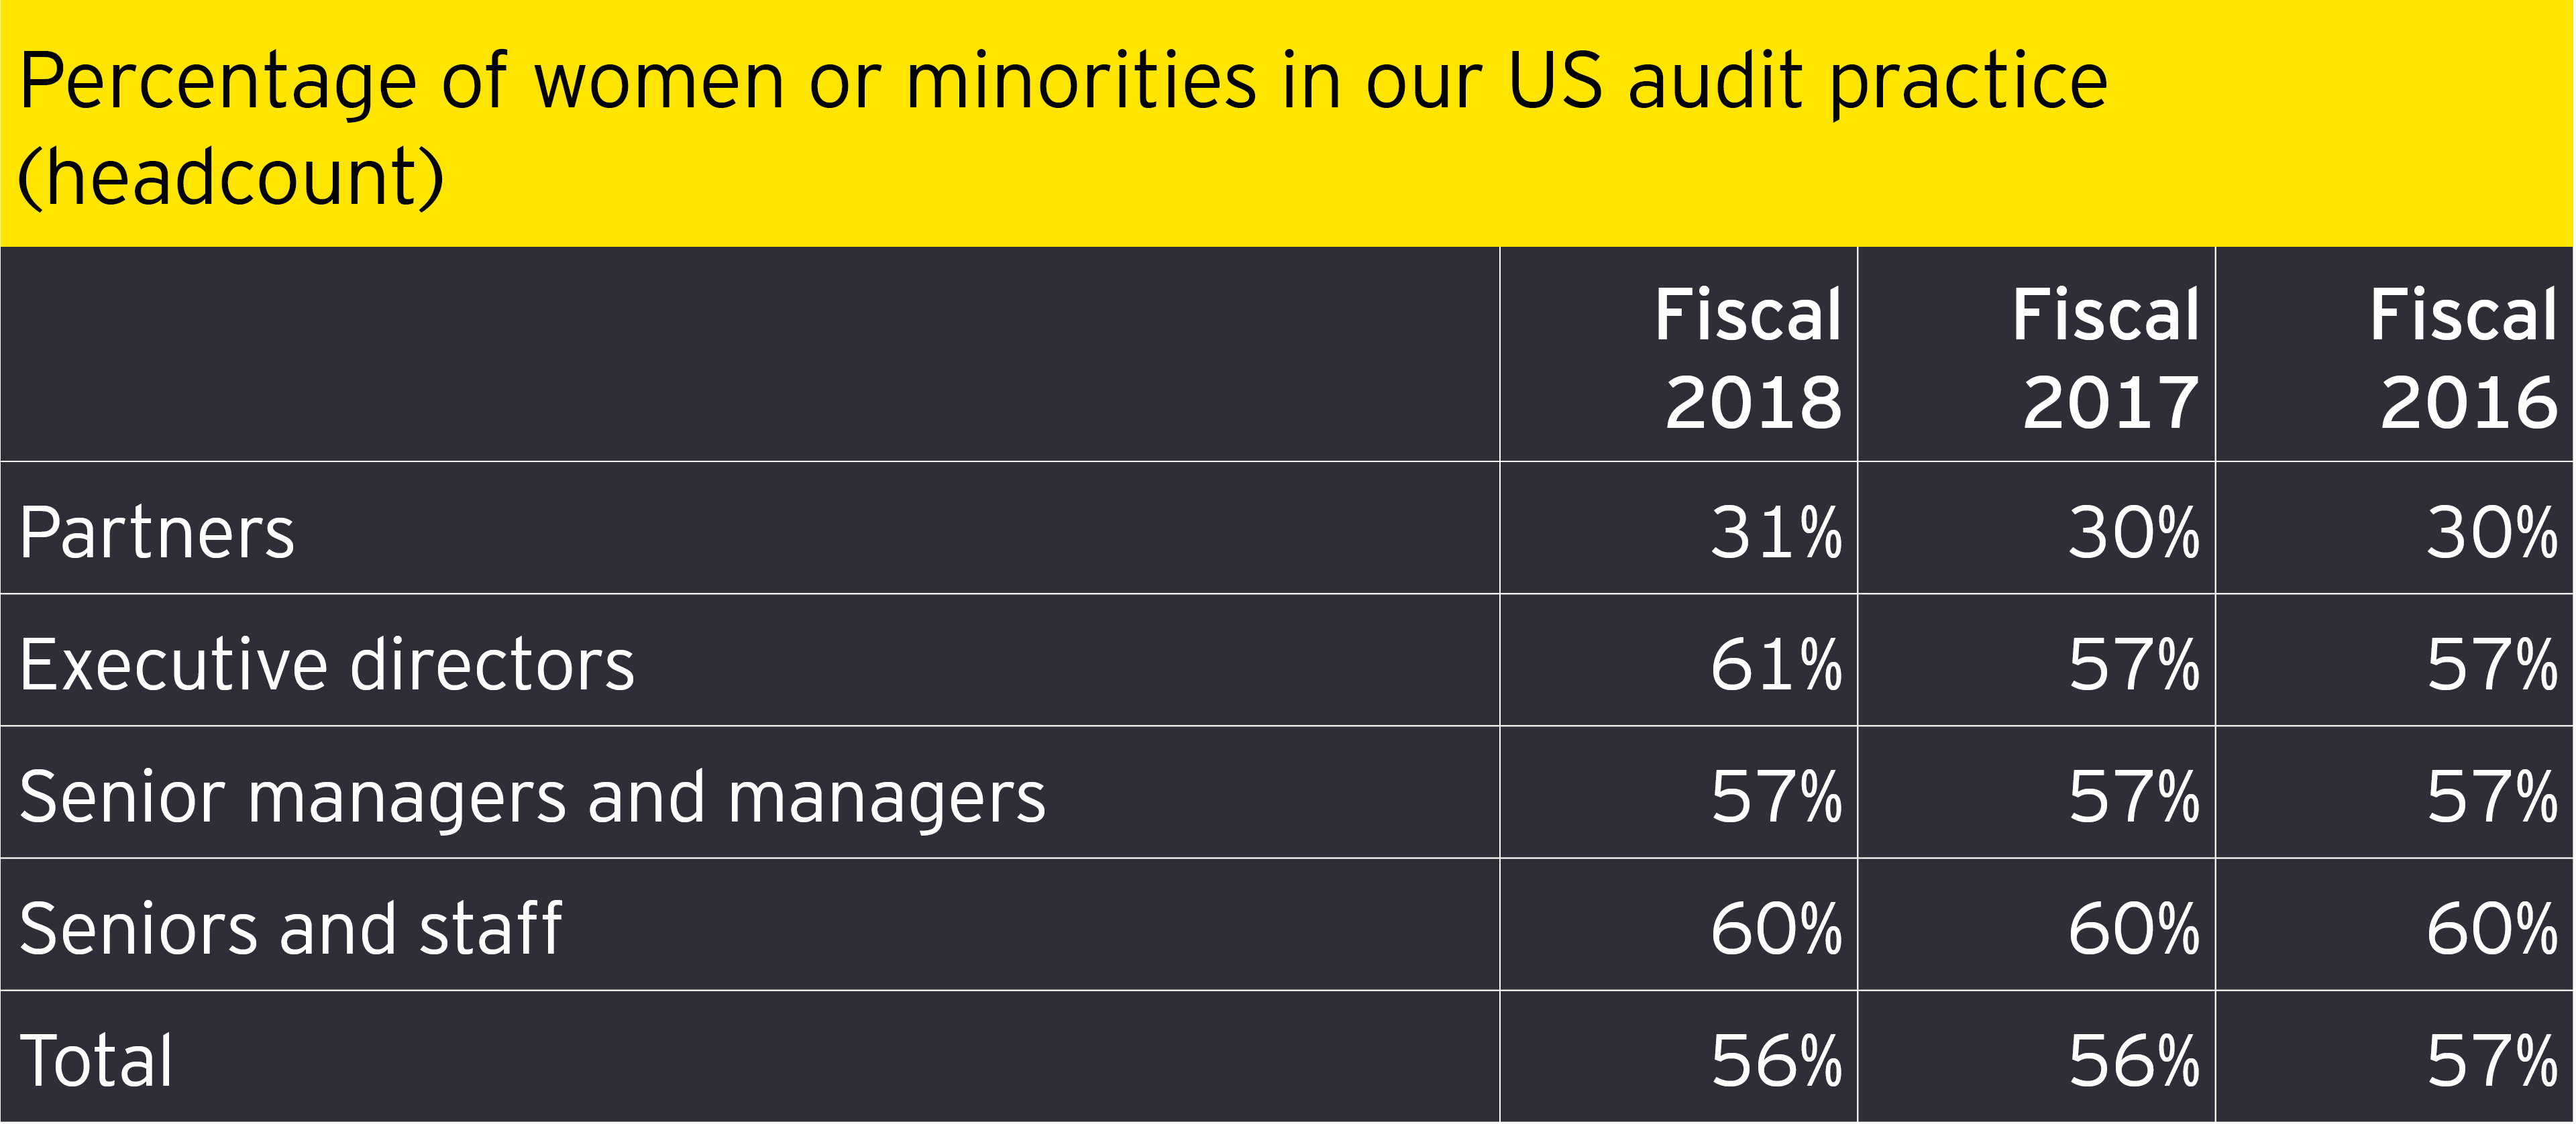 Percentage of women or minorities in our US audit practice